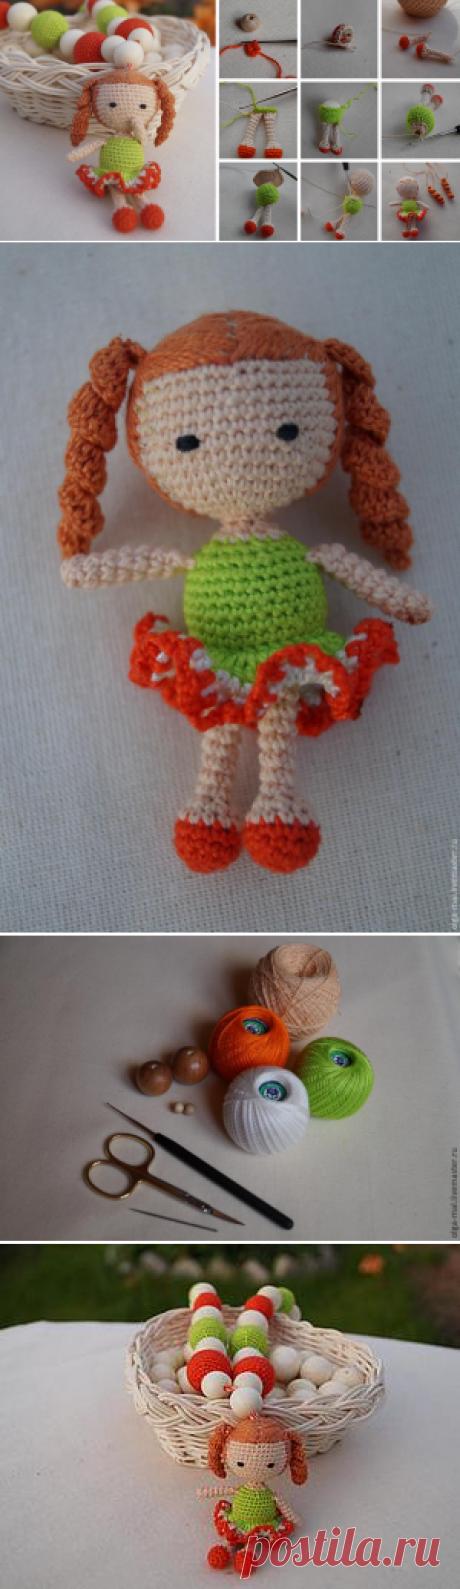 Мастер-класс: вязаная куколка для слингобус - Ярмарка Мастеров - ручная работа, handmade